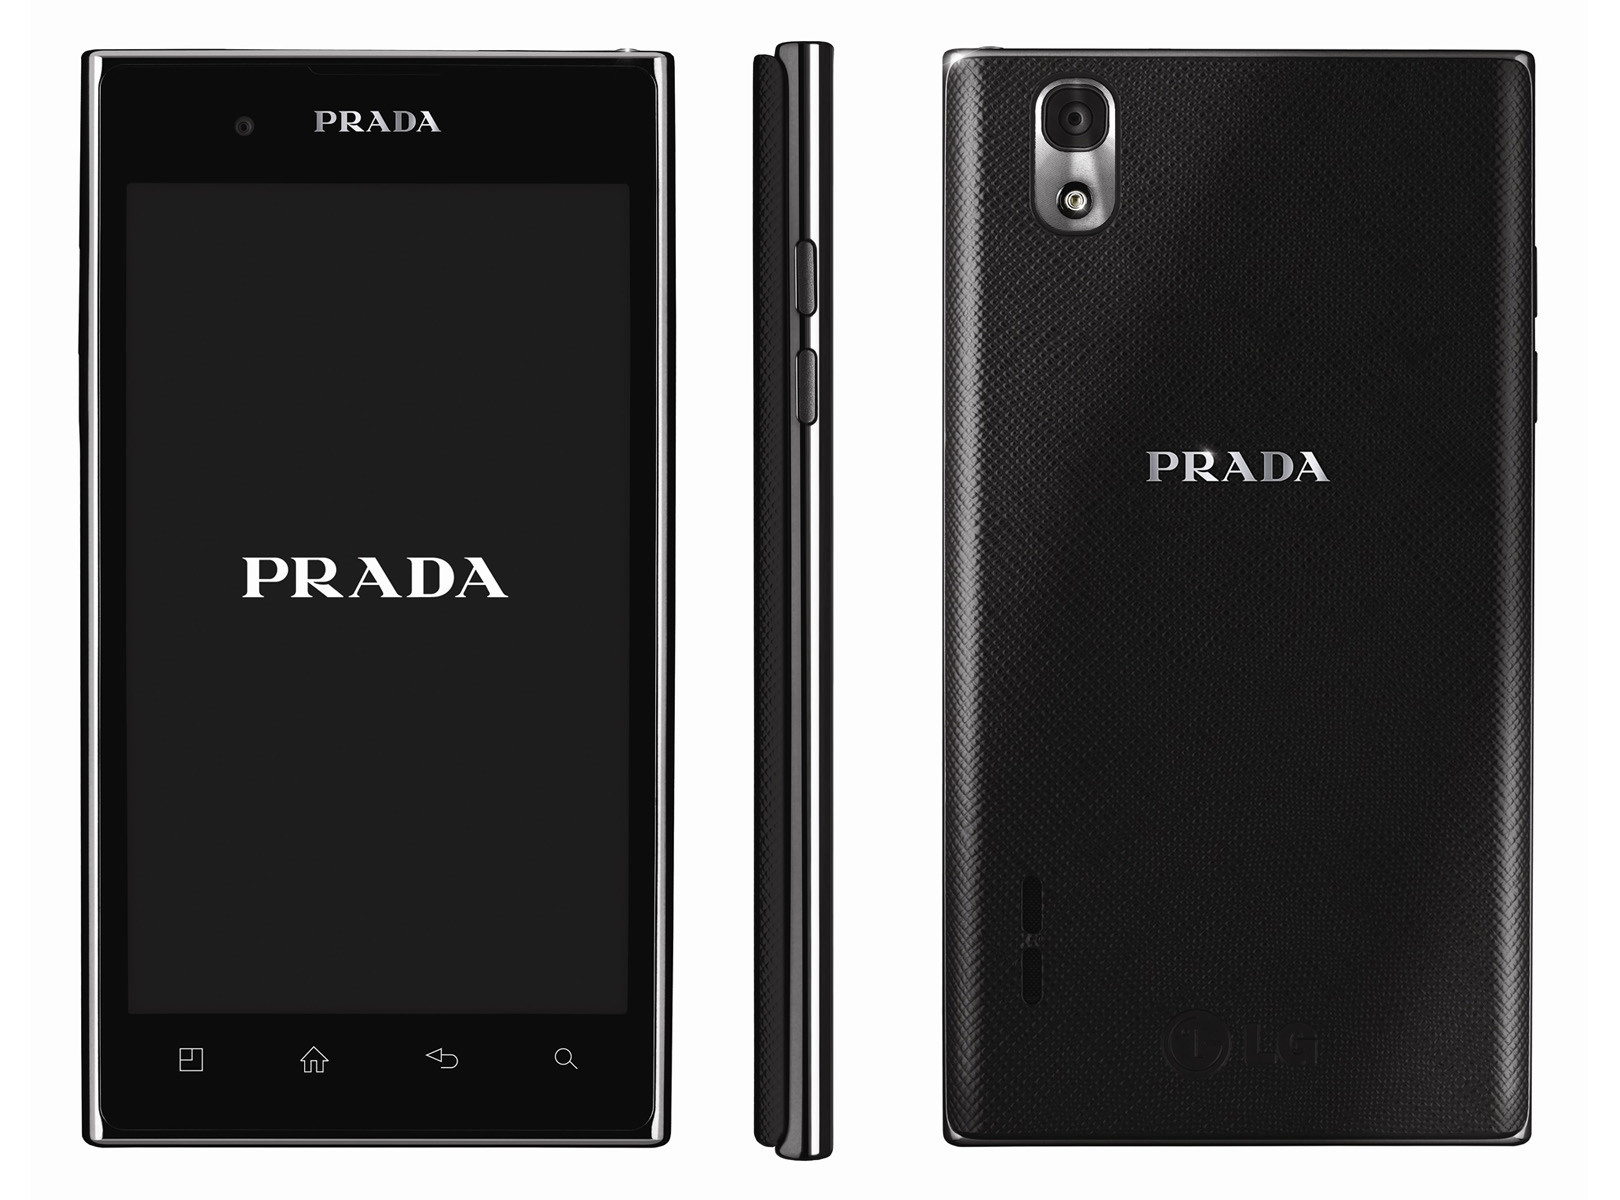 LG Prada 3.0 - Specs and Price